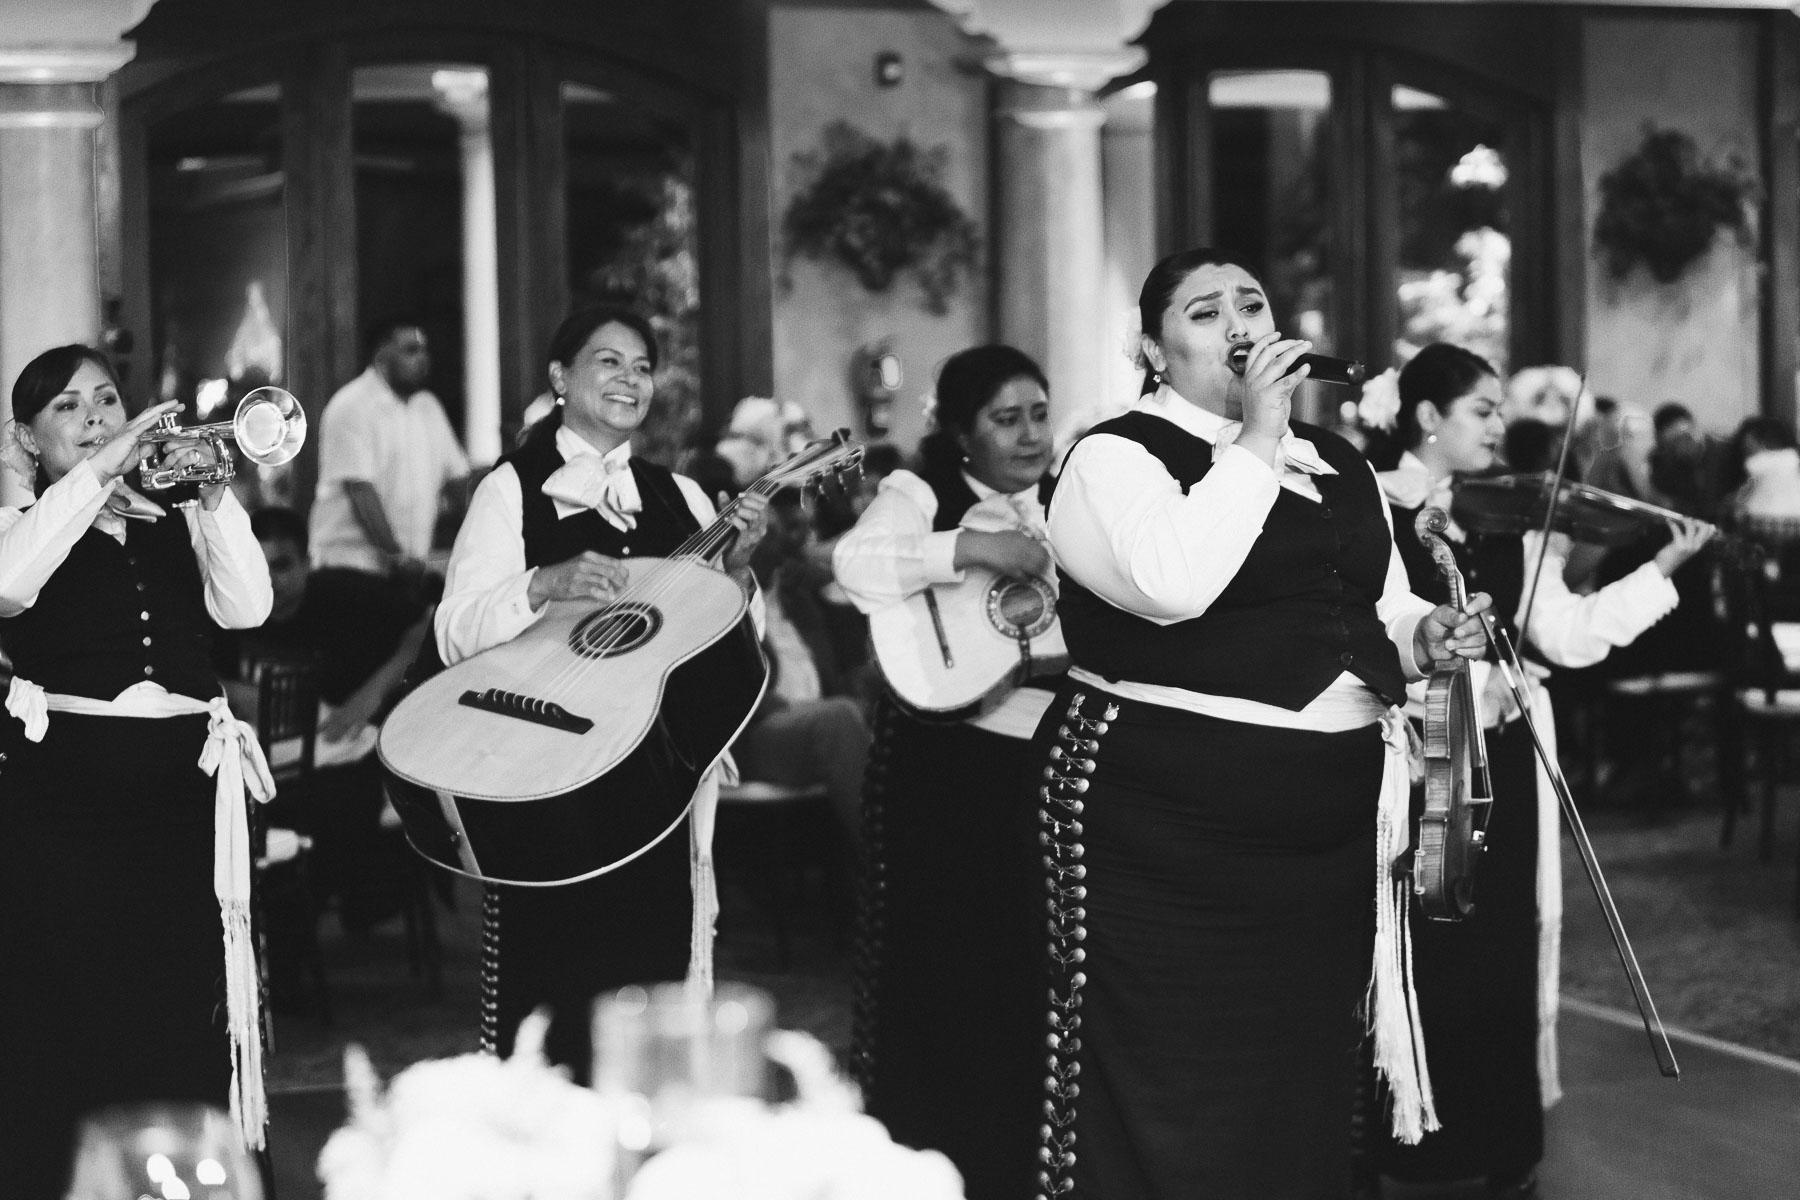 161029-Luxium-Weddings-Arizona-Jeff-Griselda-First-Look-Val-Vista-Lakes-Gilber-075.jpg